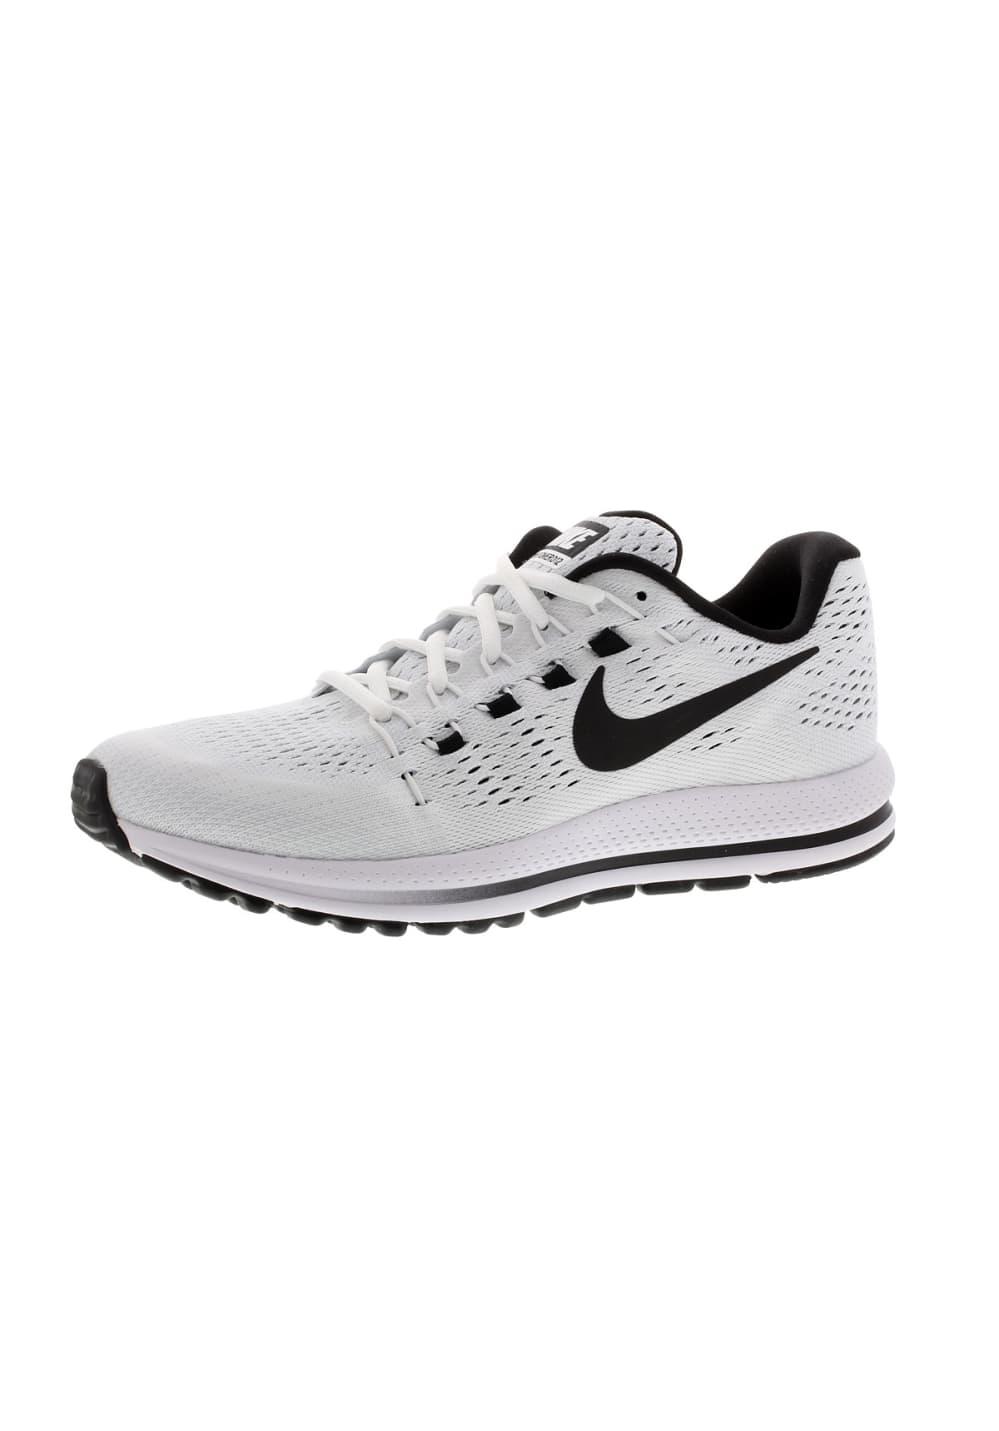 Nike Air Zoom Vomero 12 Laufschuhe Herren Grau